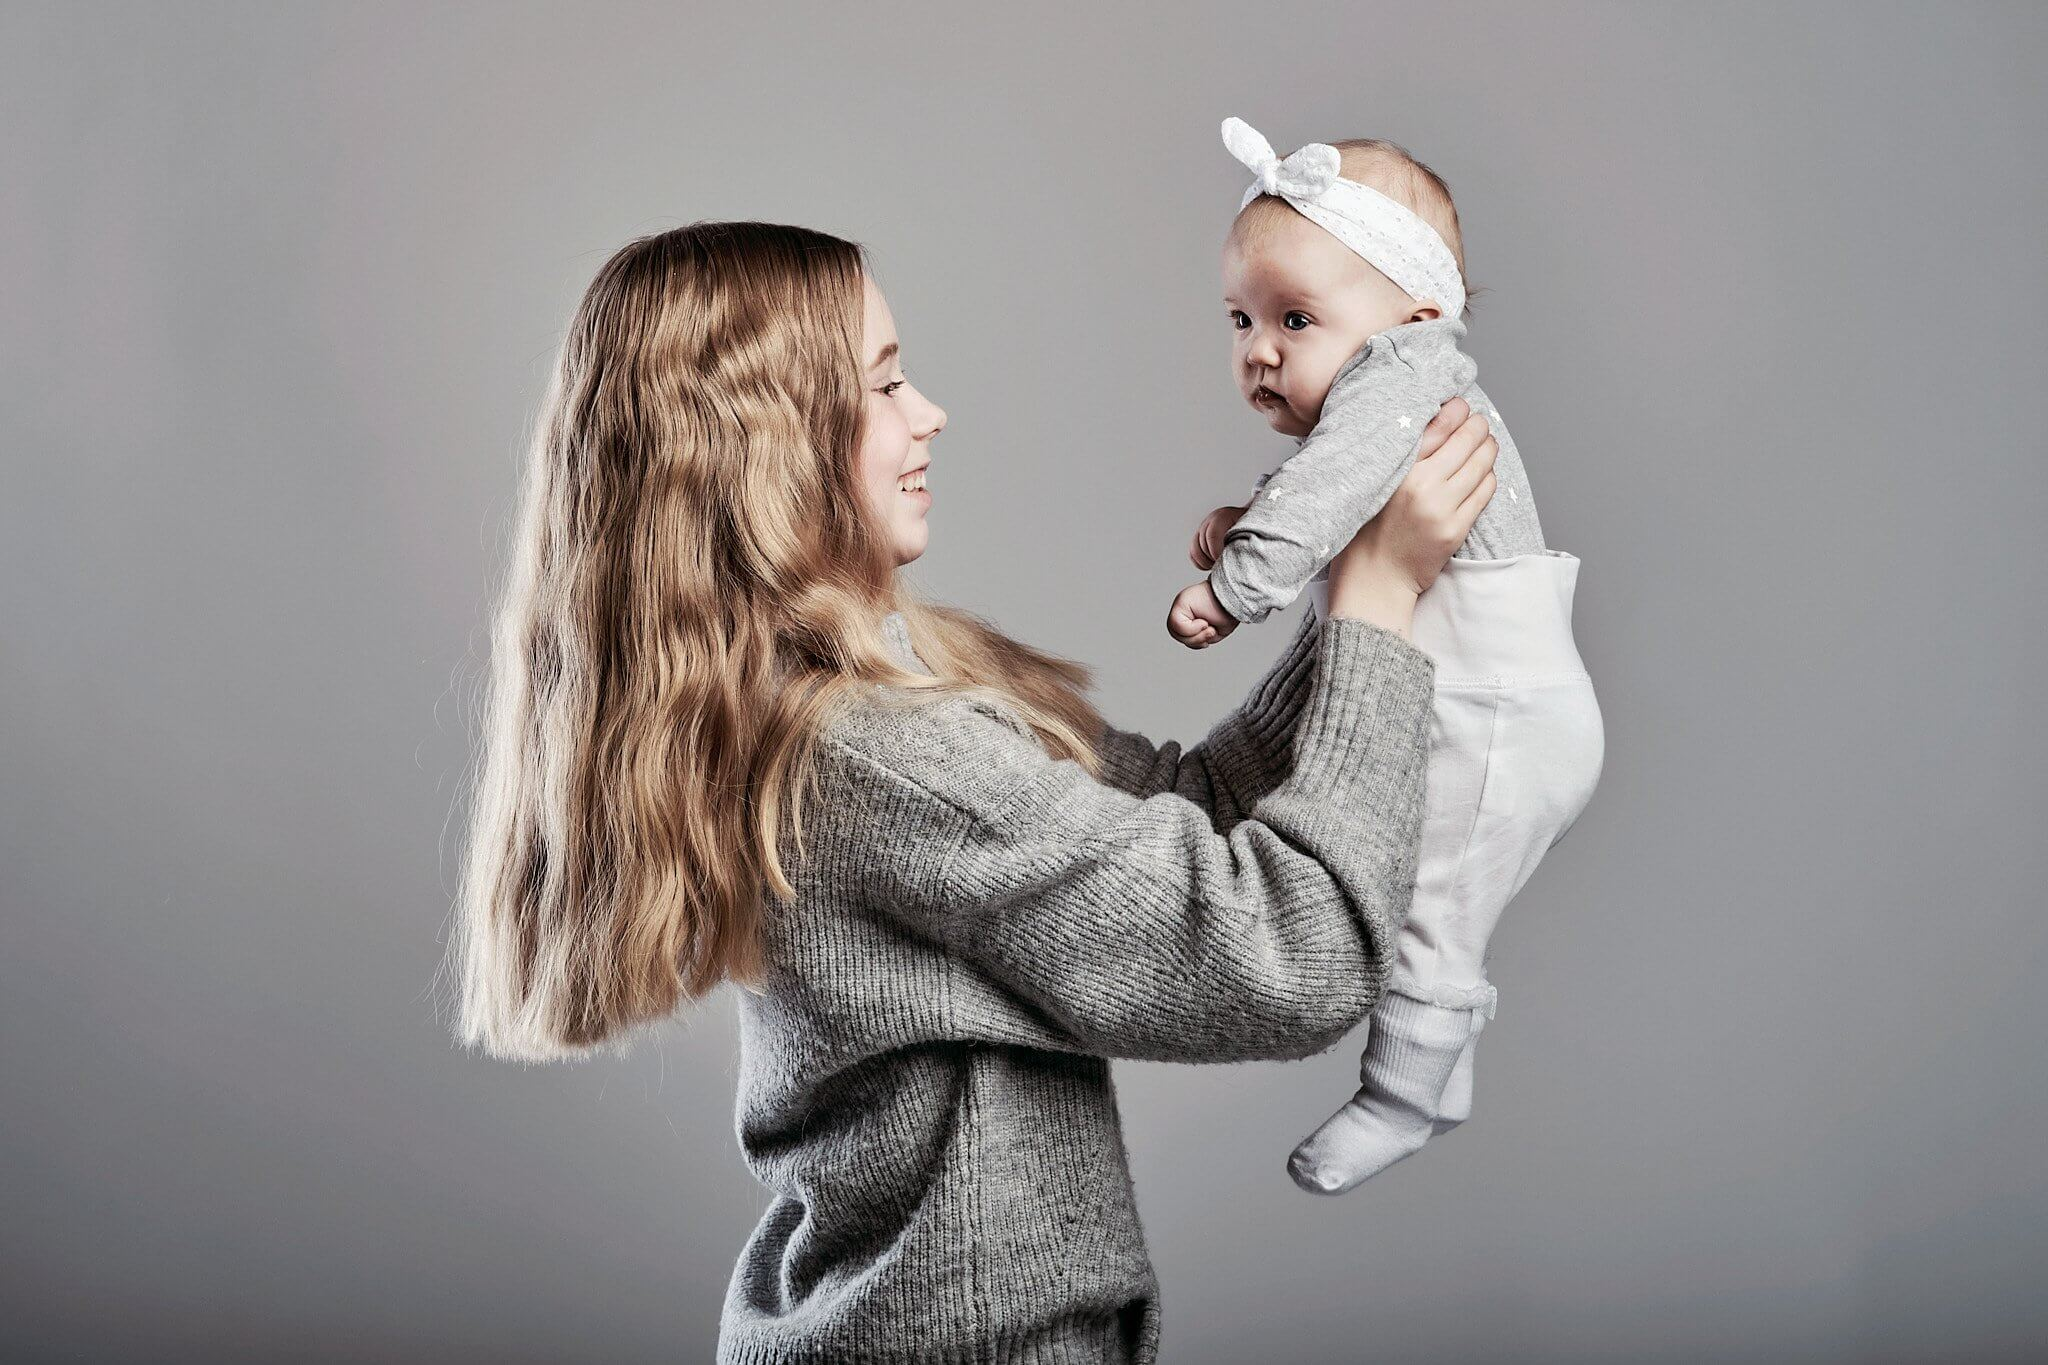 Lapsikuvaus Jyväskylä Martta ja Hilma sisarukset